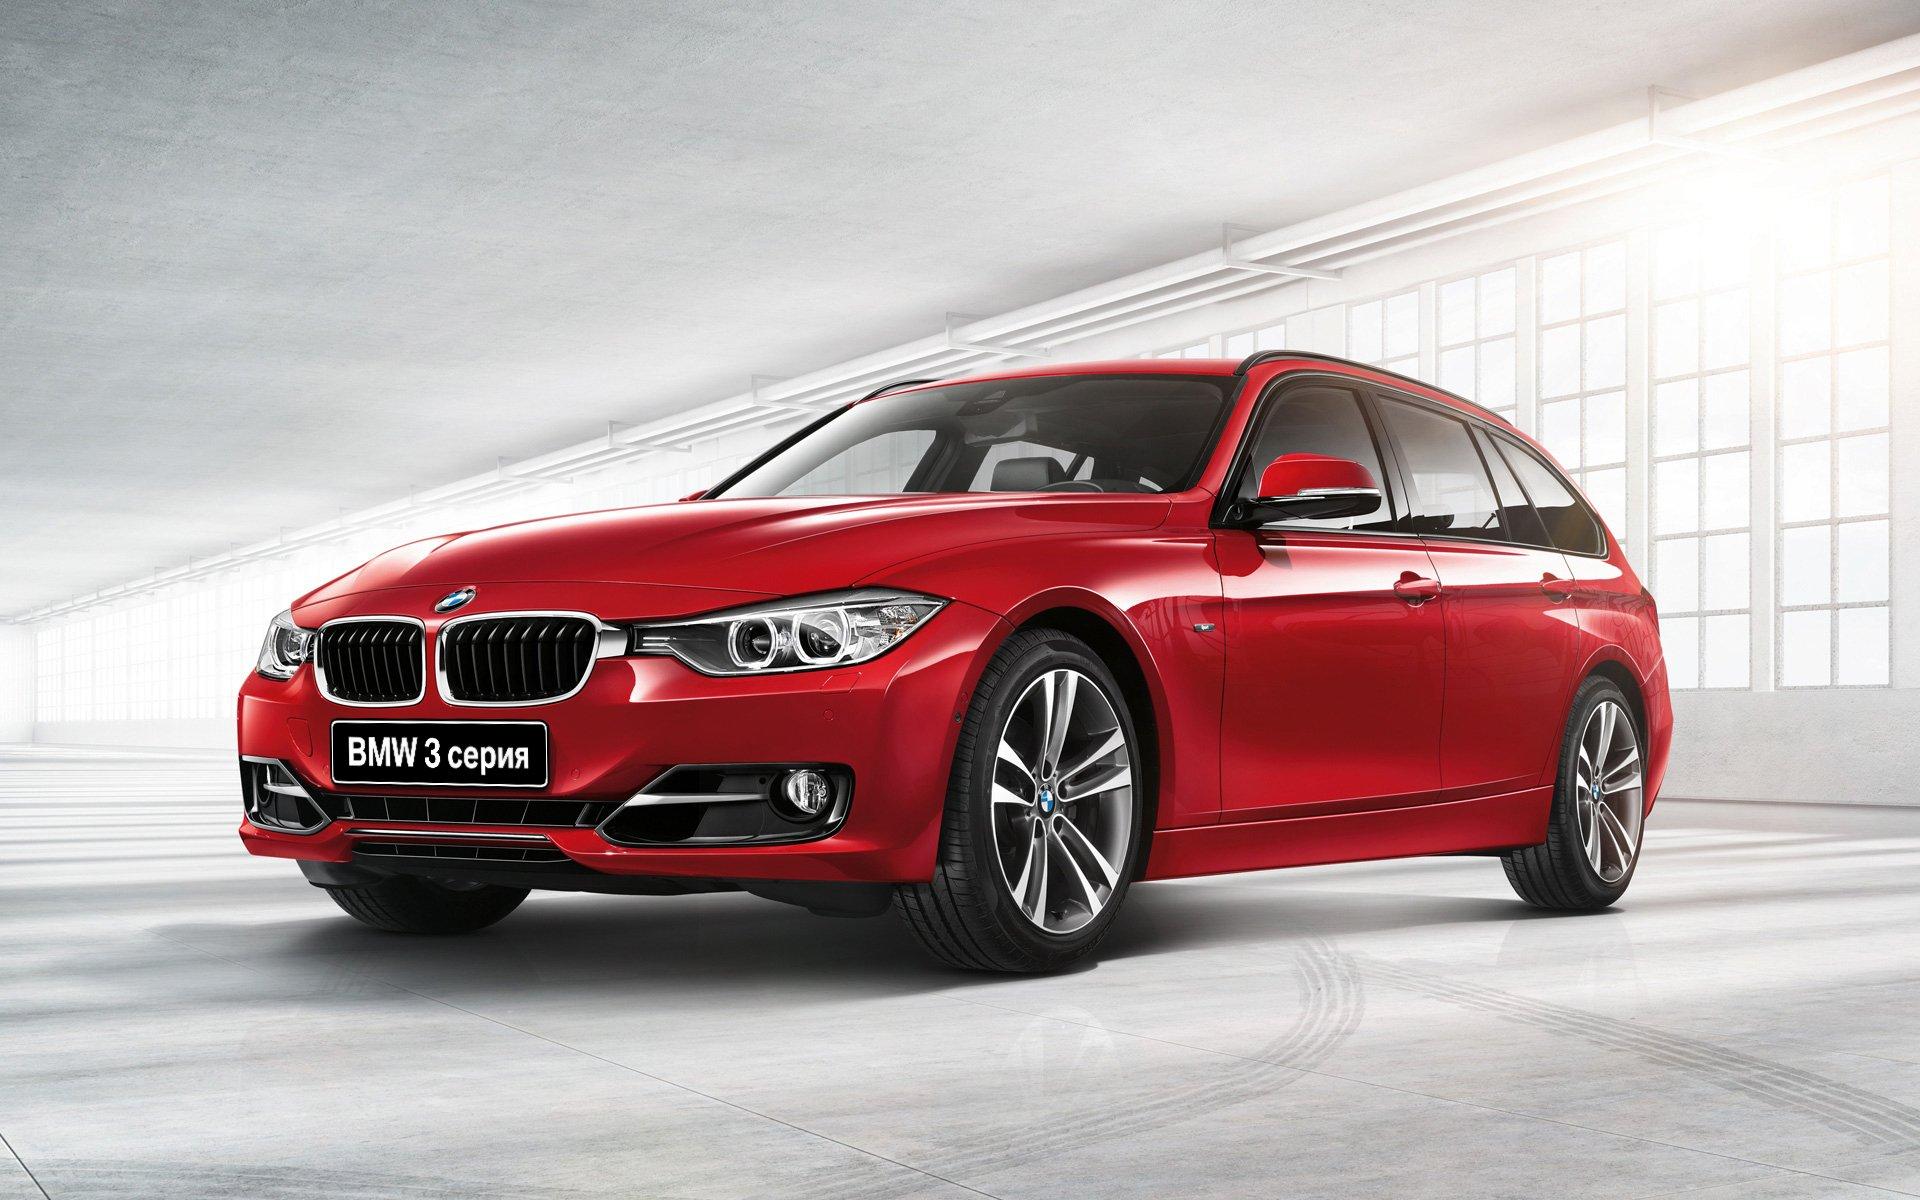 BMW 3 Series HD Wallpaper   Background Image   1920x1200 ...